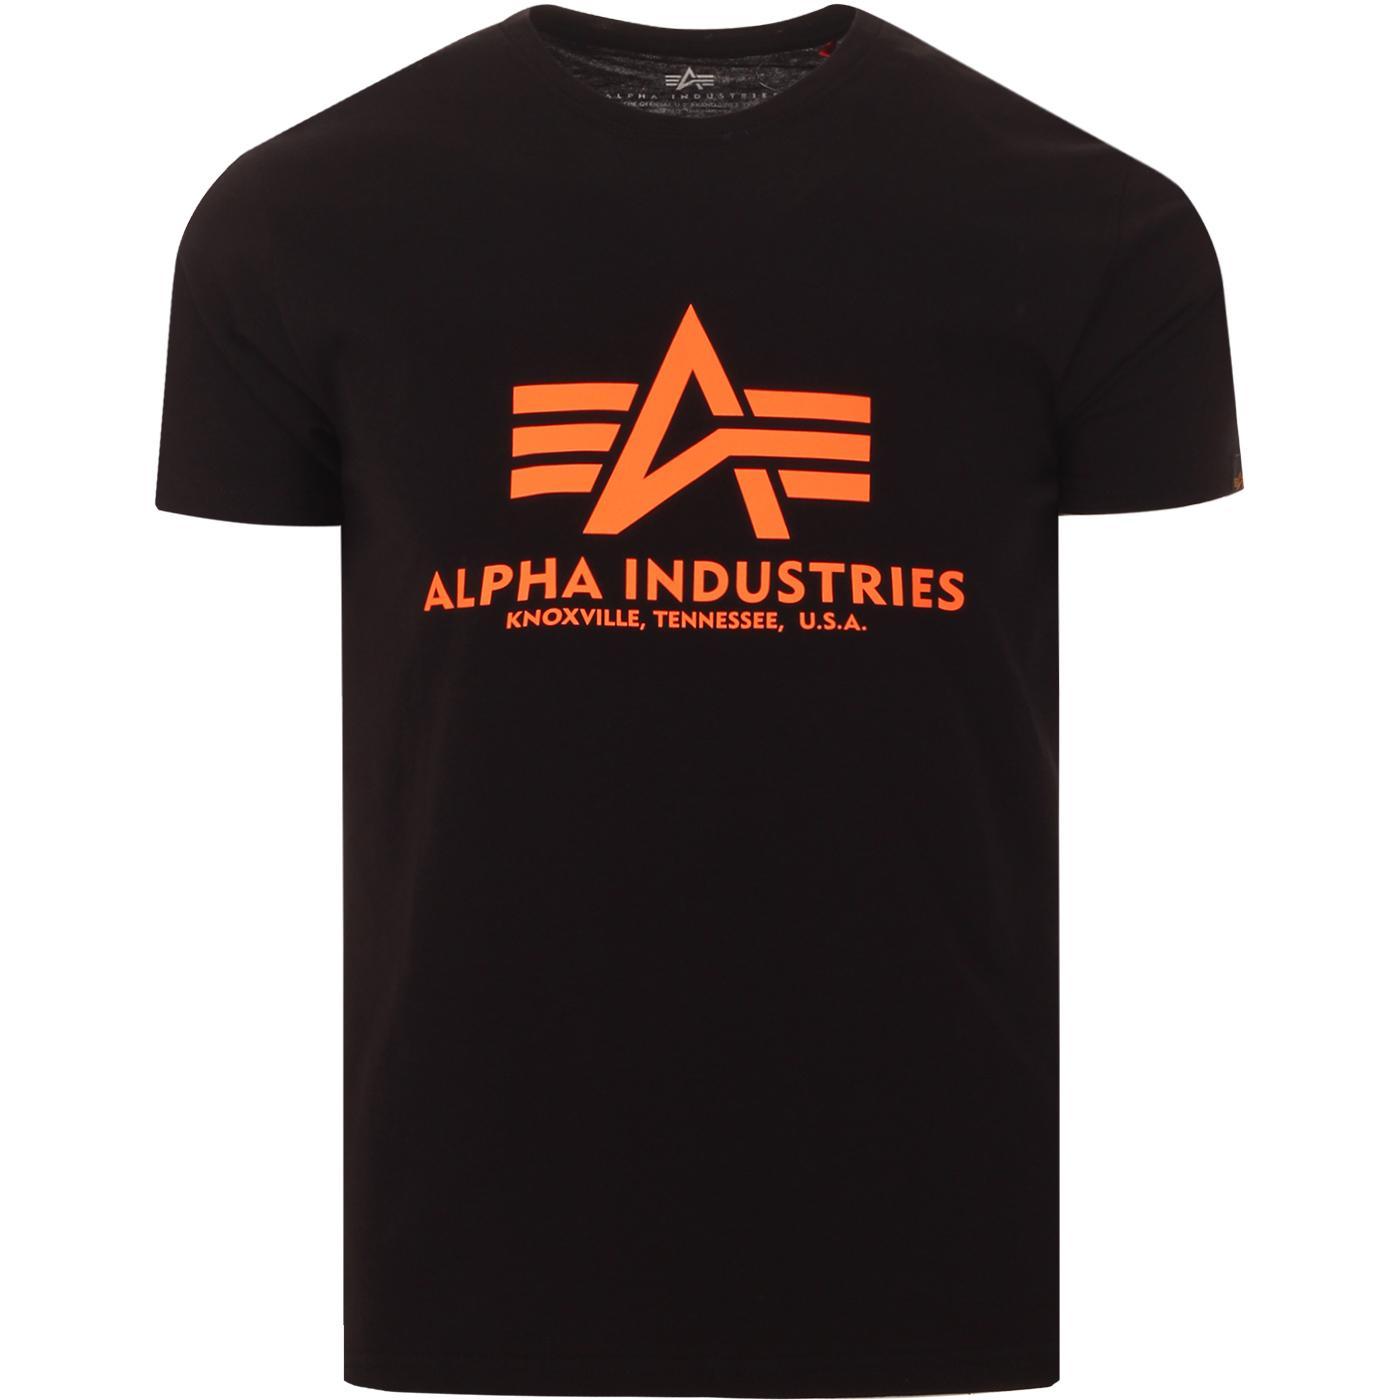 ALPHA INDUSTRIES Retro Reflective Logo Tee (B/O)